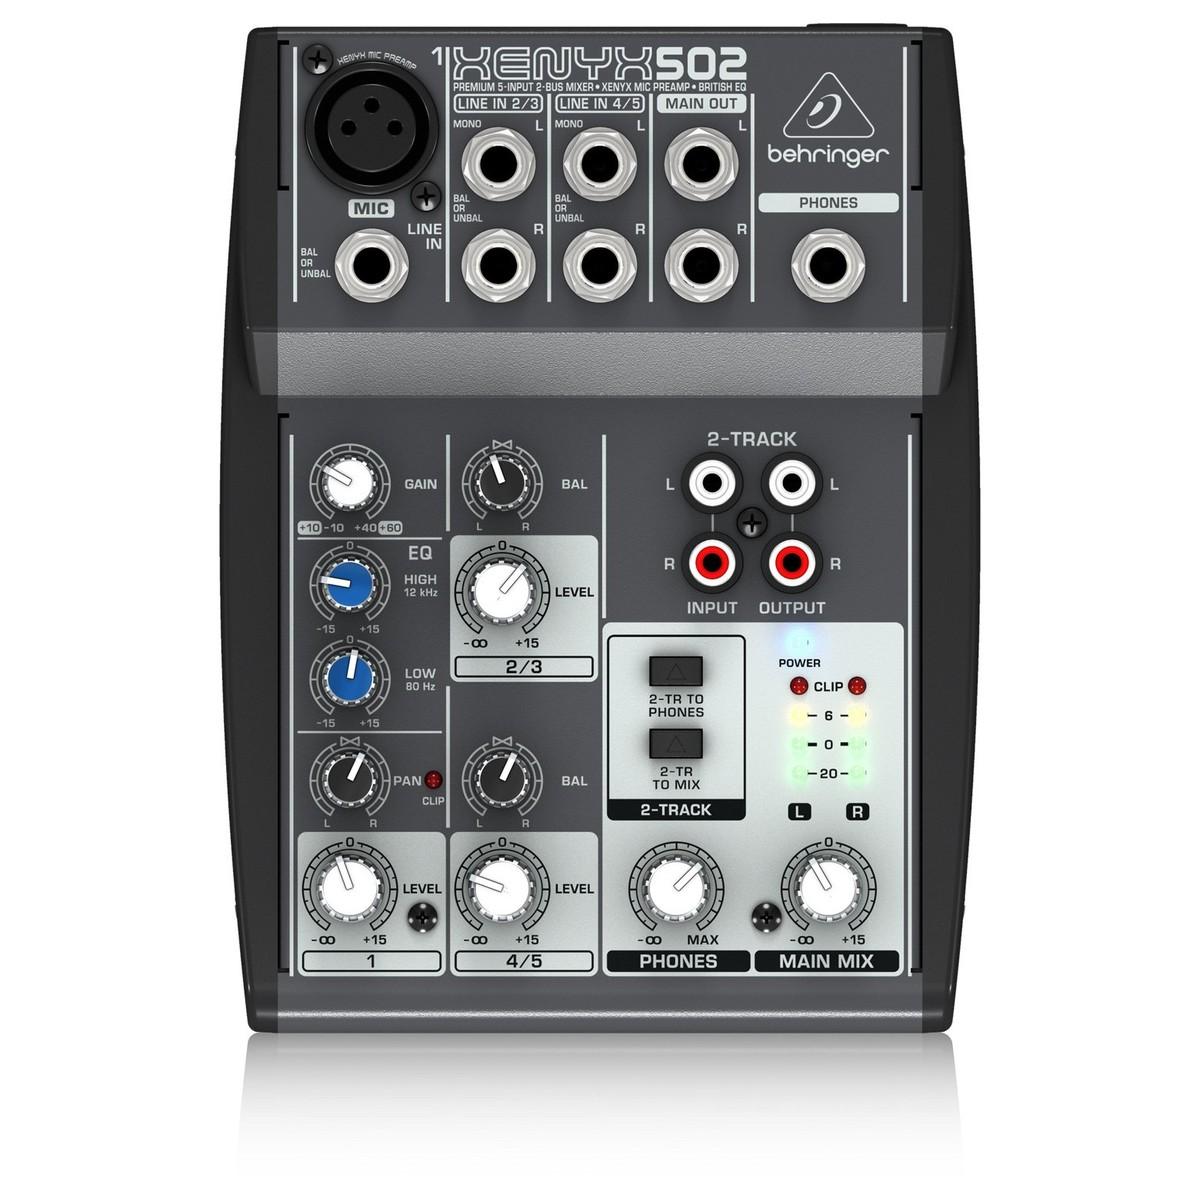 behringer xenyx 502 mixer at gear4music. Black Bedroom Furniture Sets. Home Design Ideas